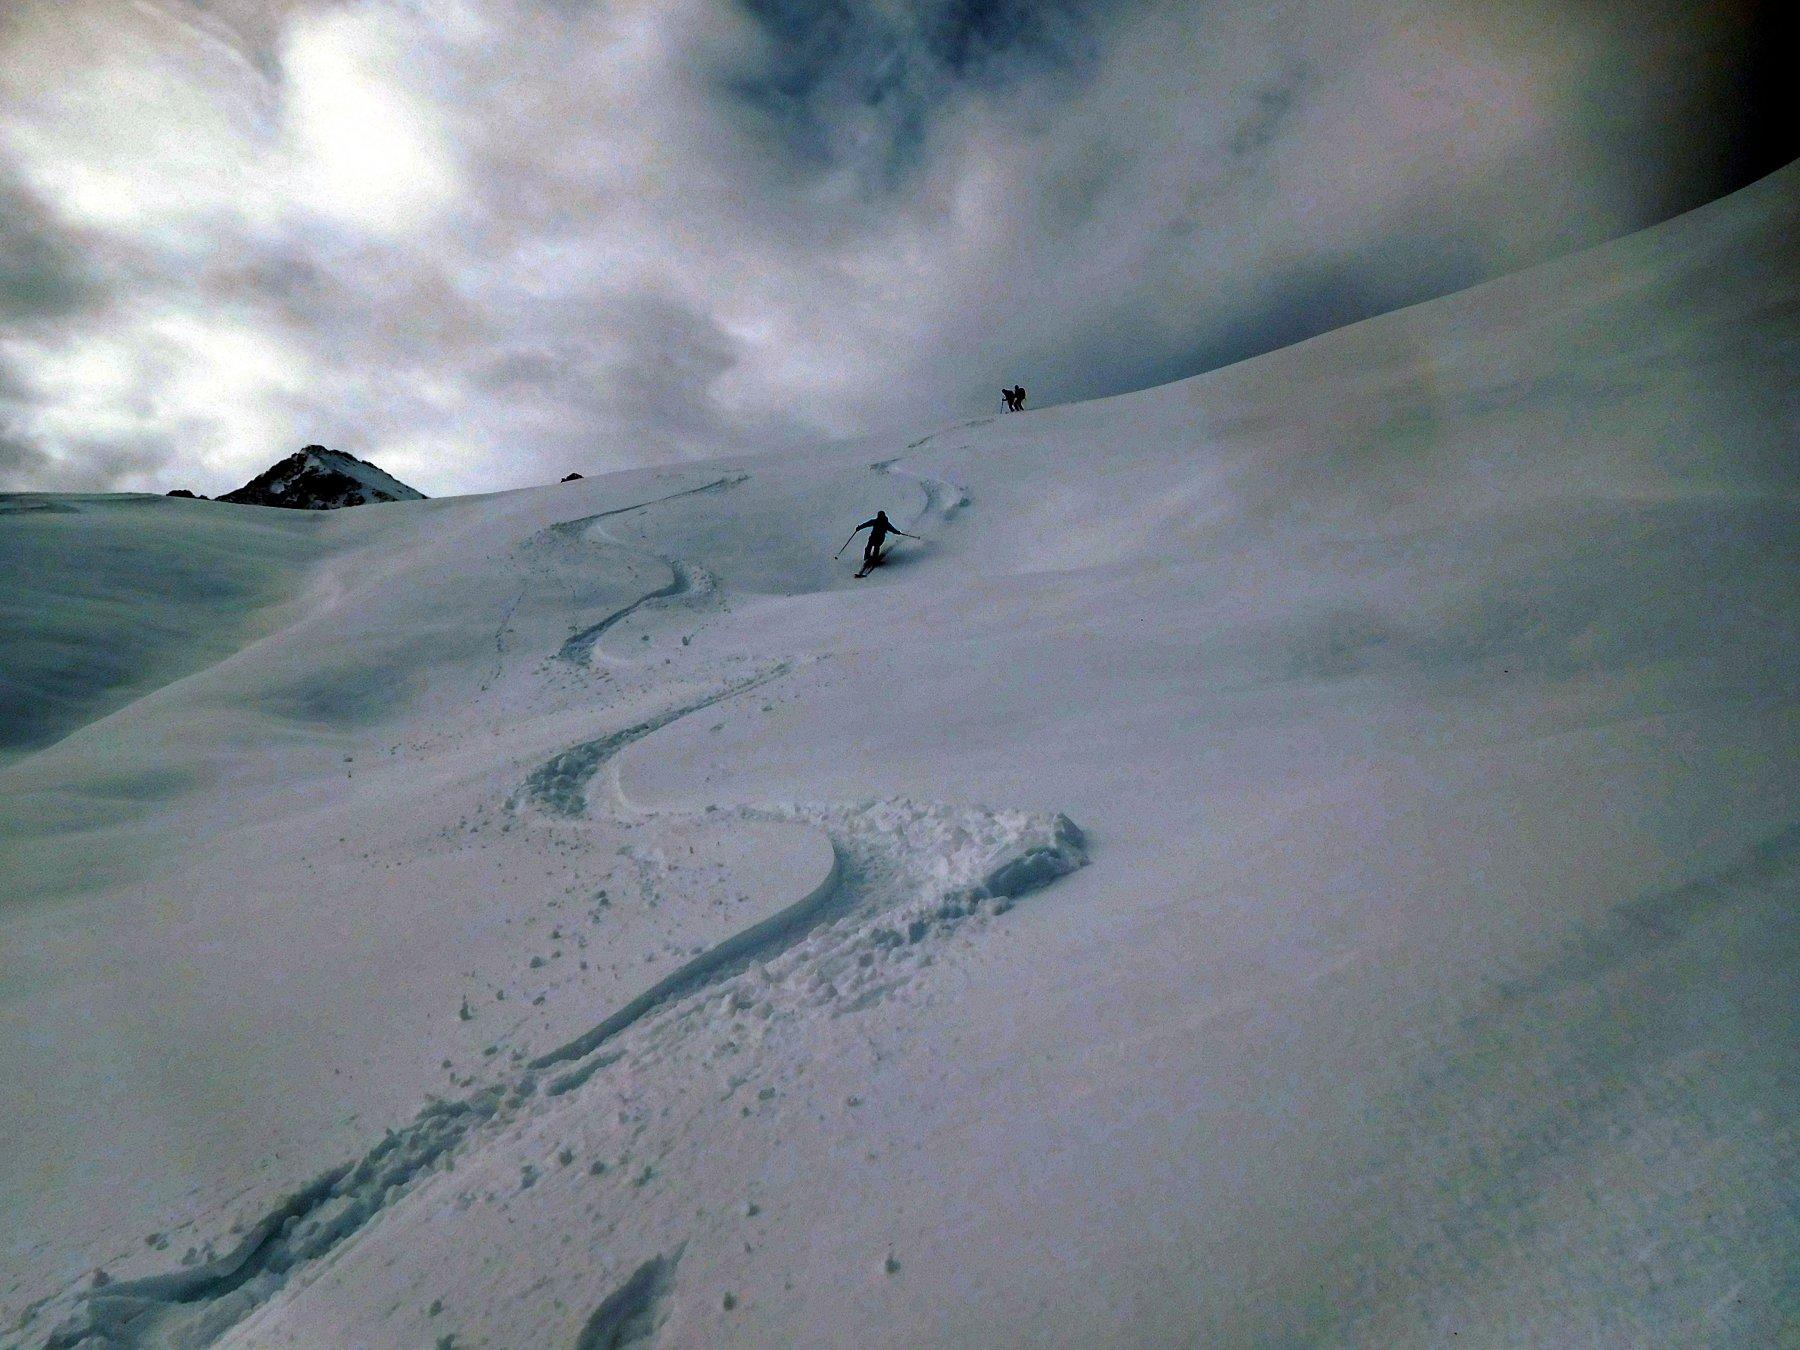 seconda discesa...neve più pesante